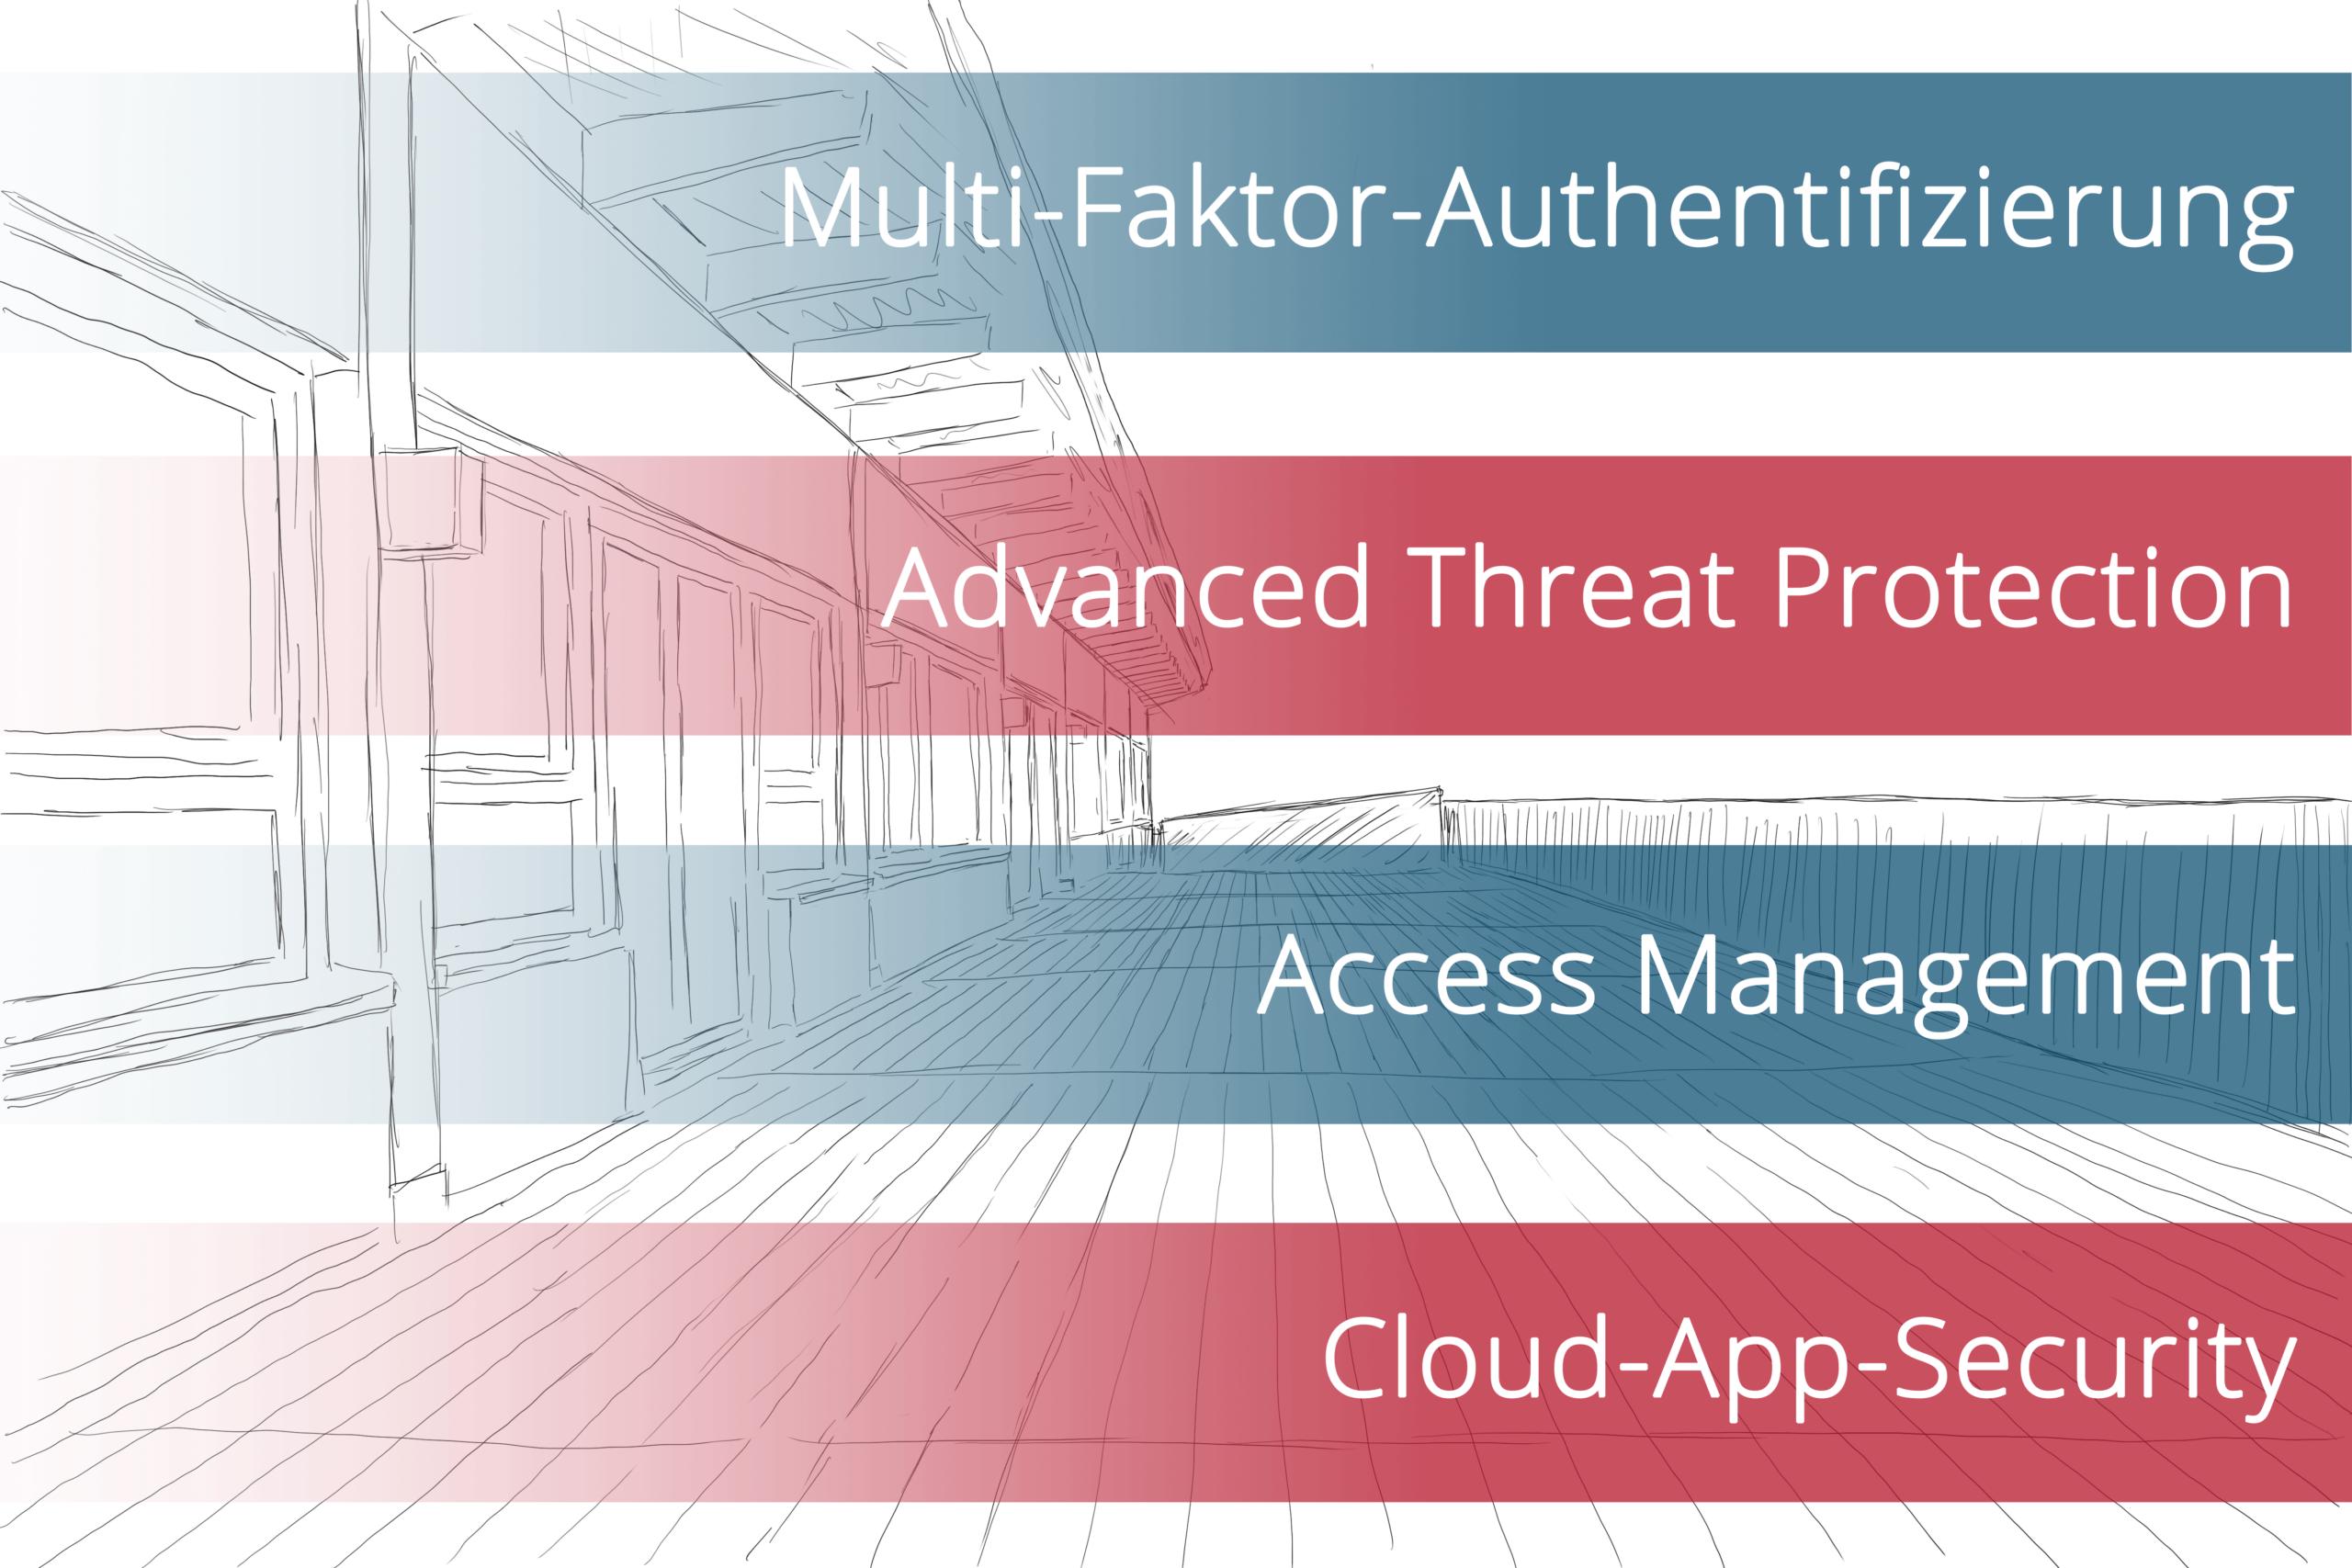 Microsoft 365 Security Bestandteile